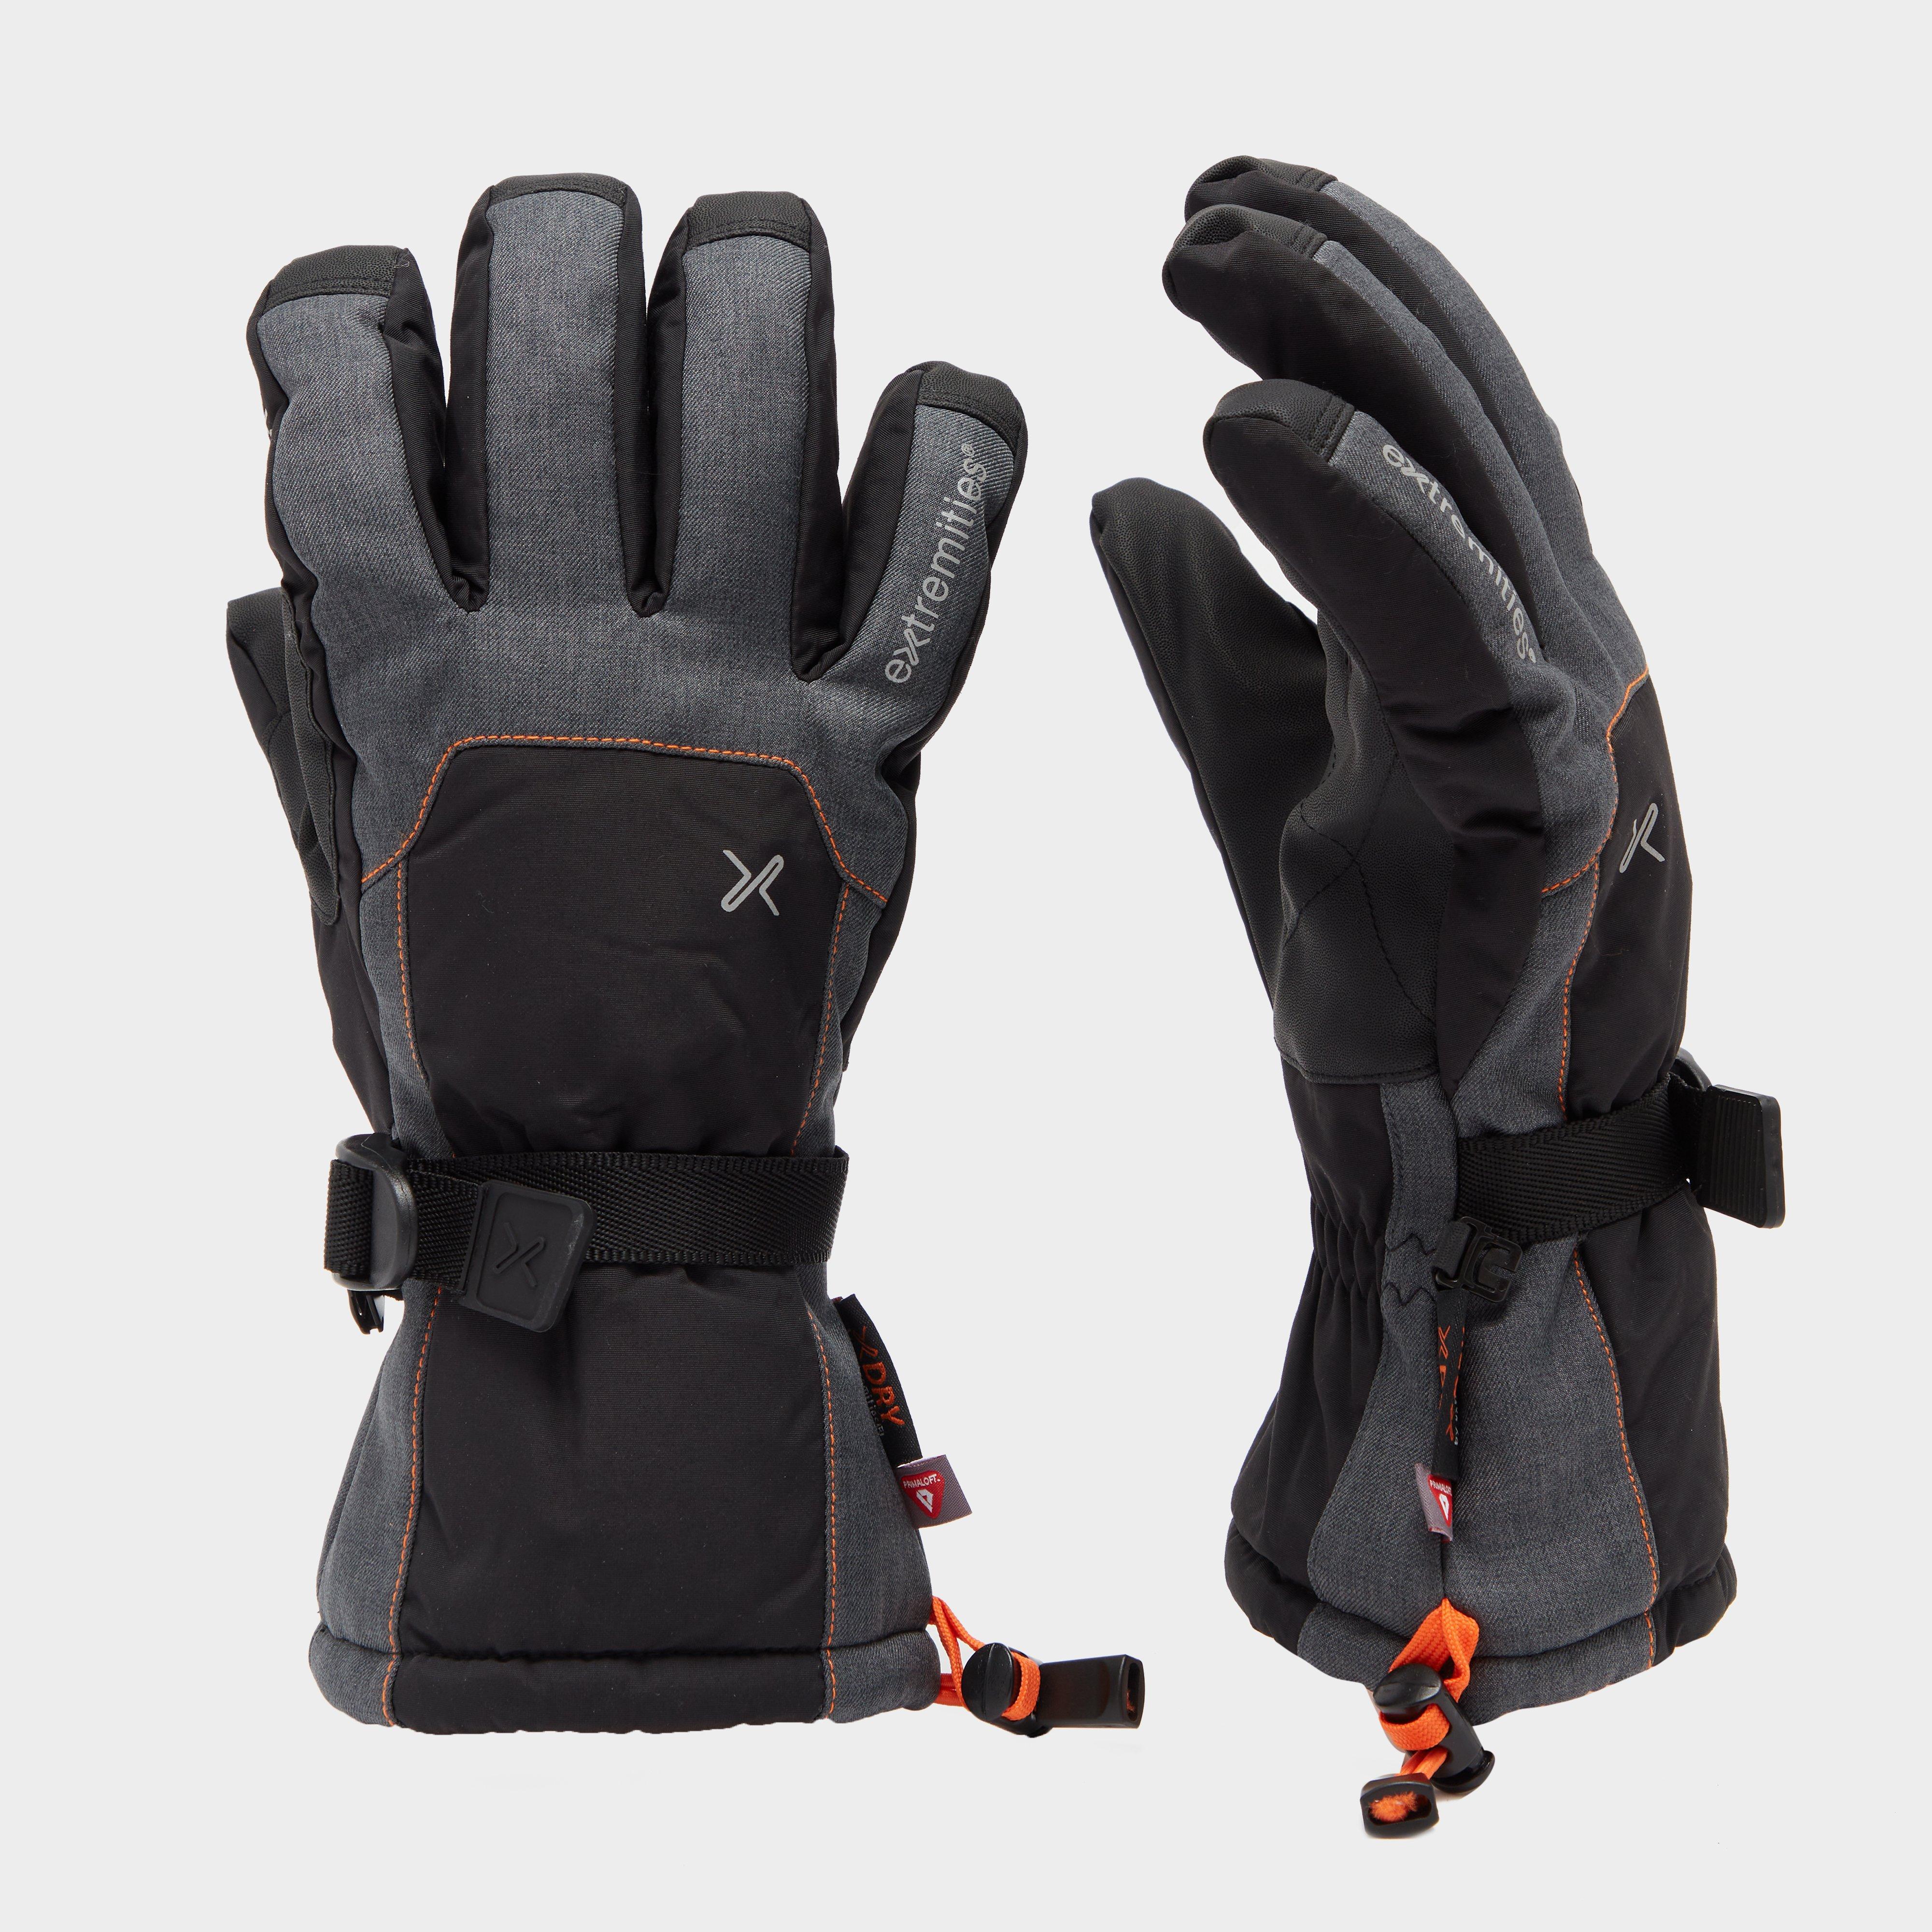 Extremities Unisex Torres Peak Glove Waterproof Breathable Super Warm Primaloft